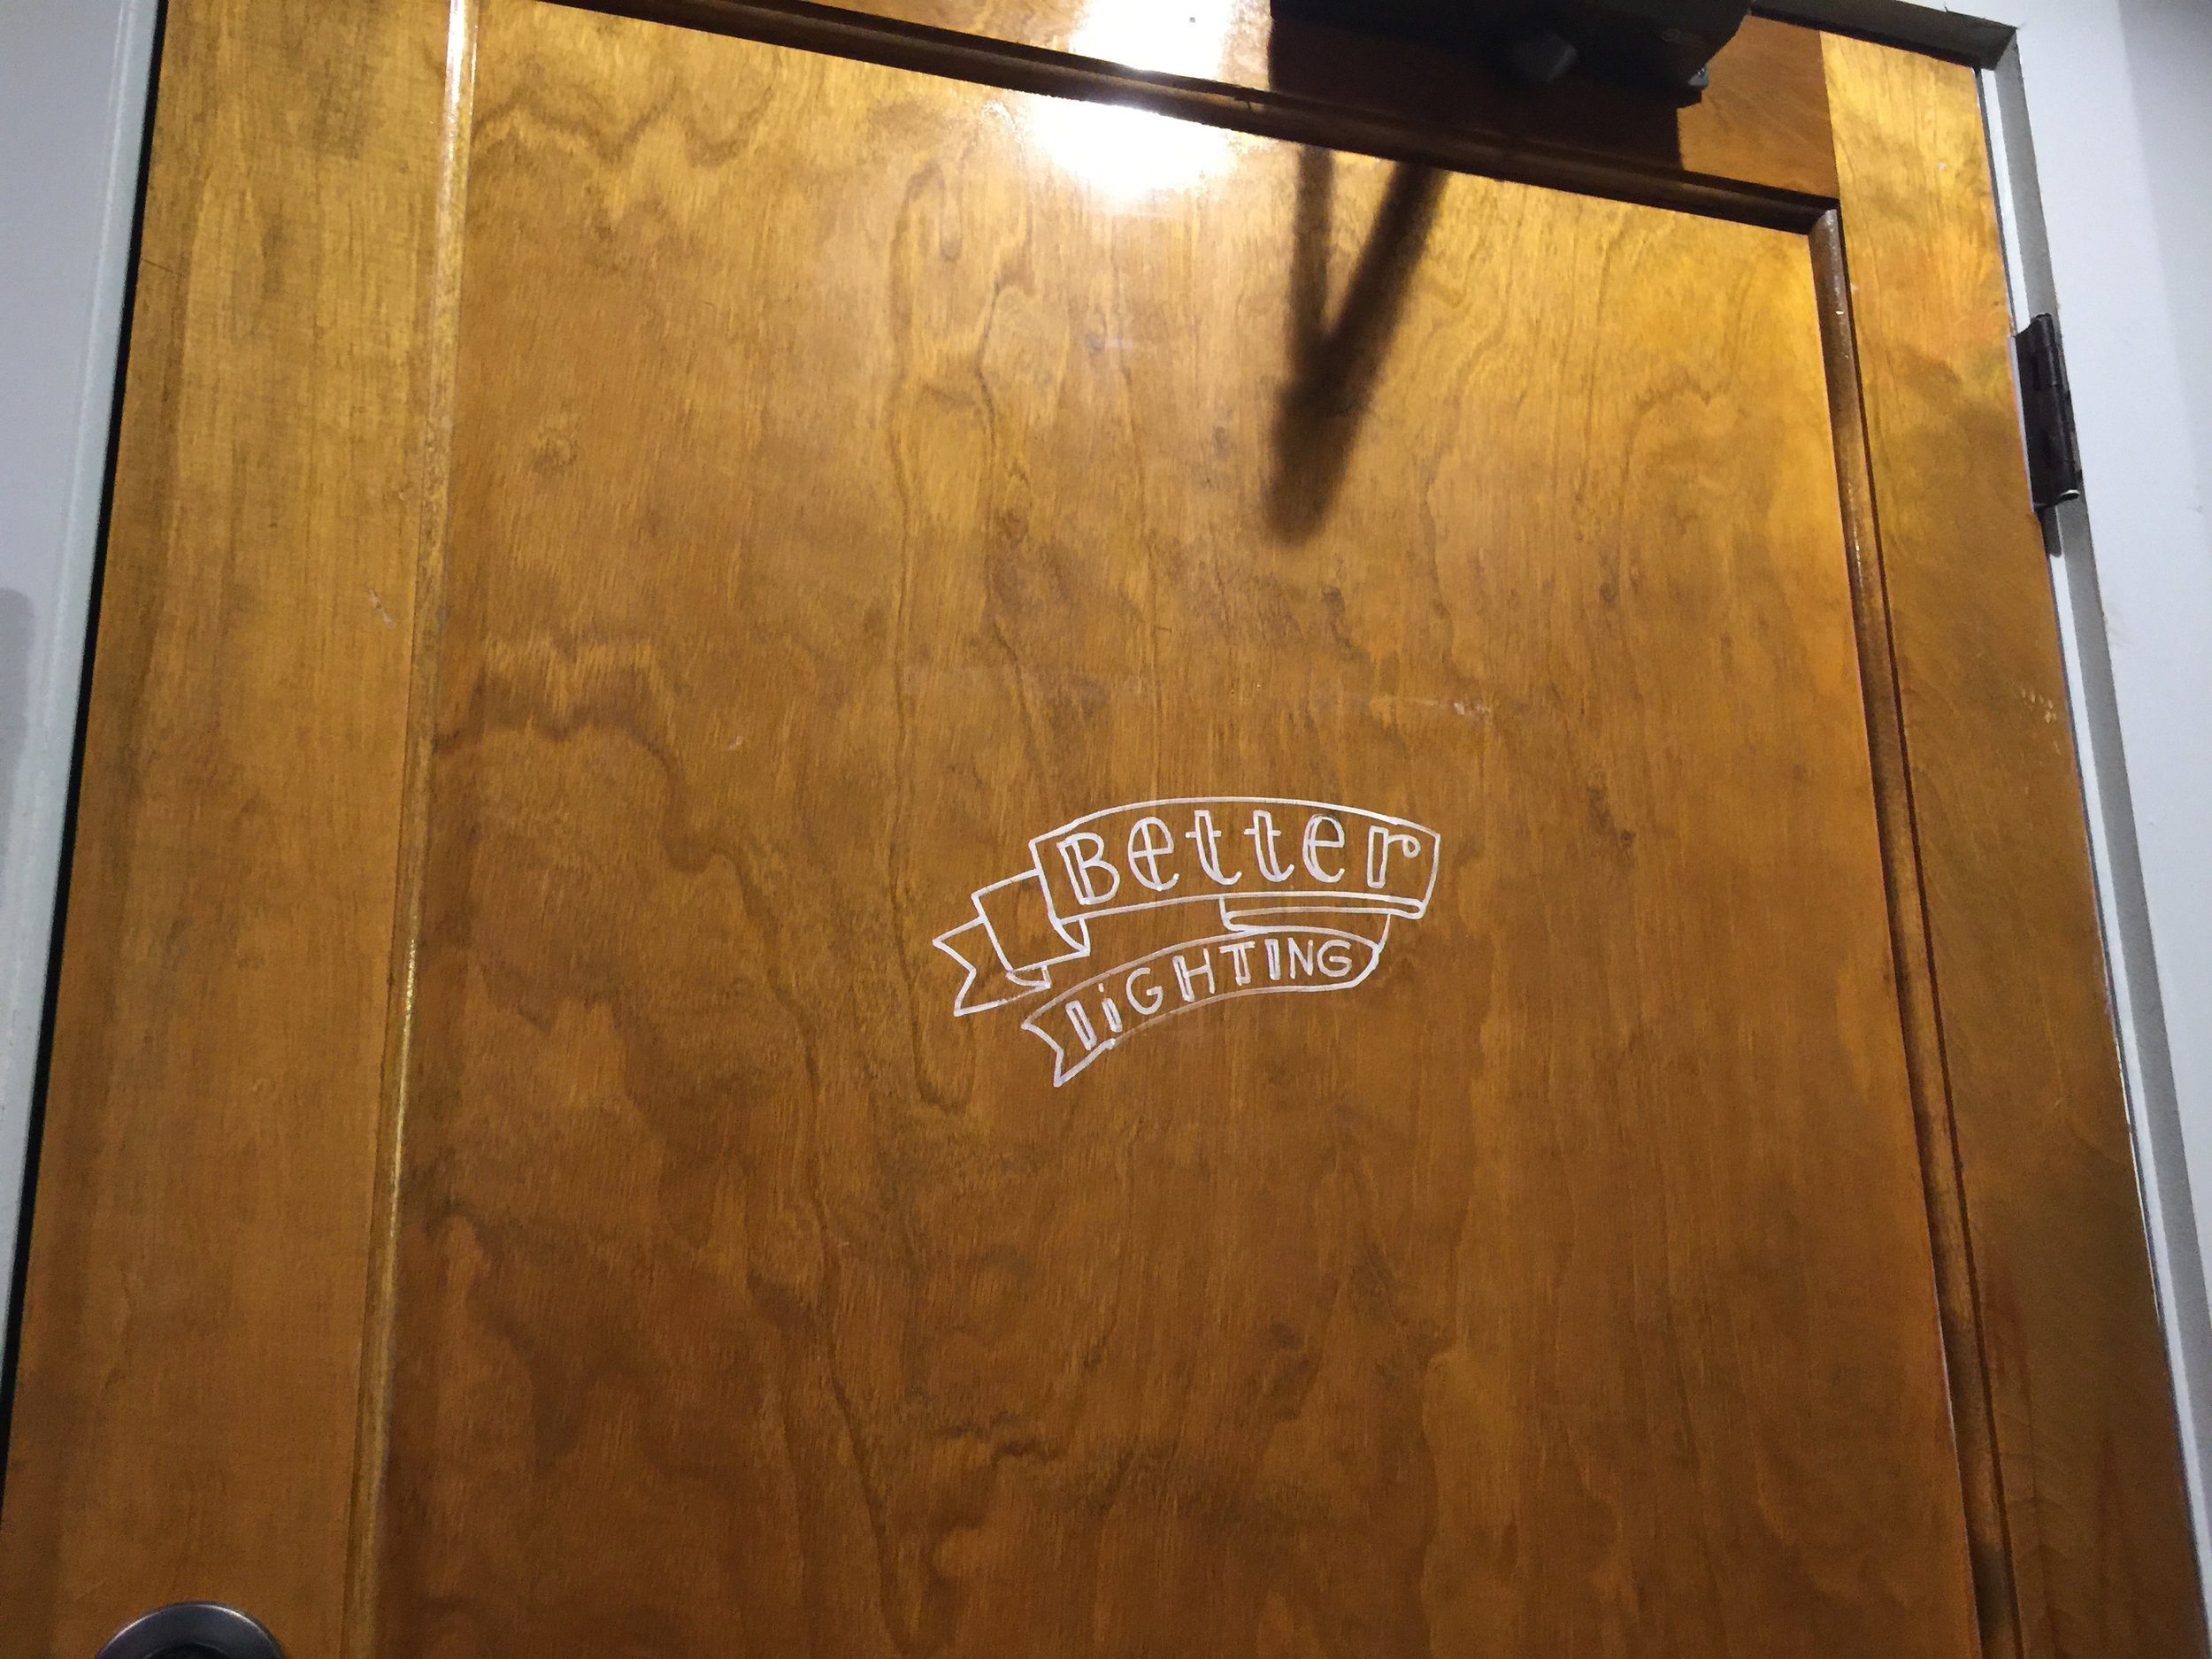 "Restroom sign. ""Better lighting""."